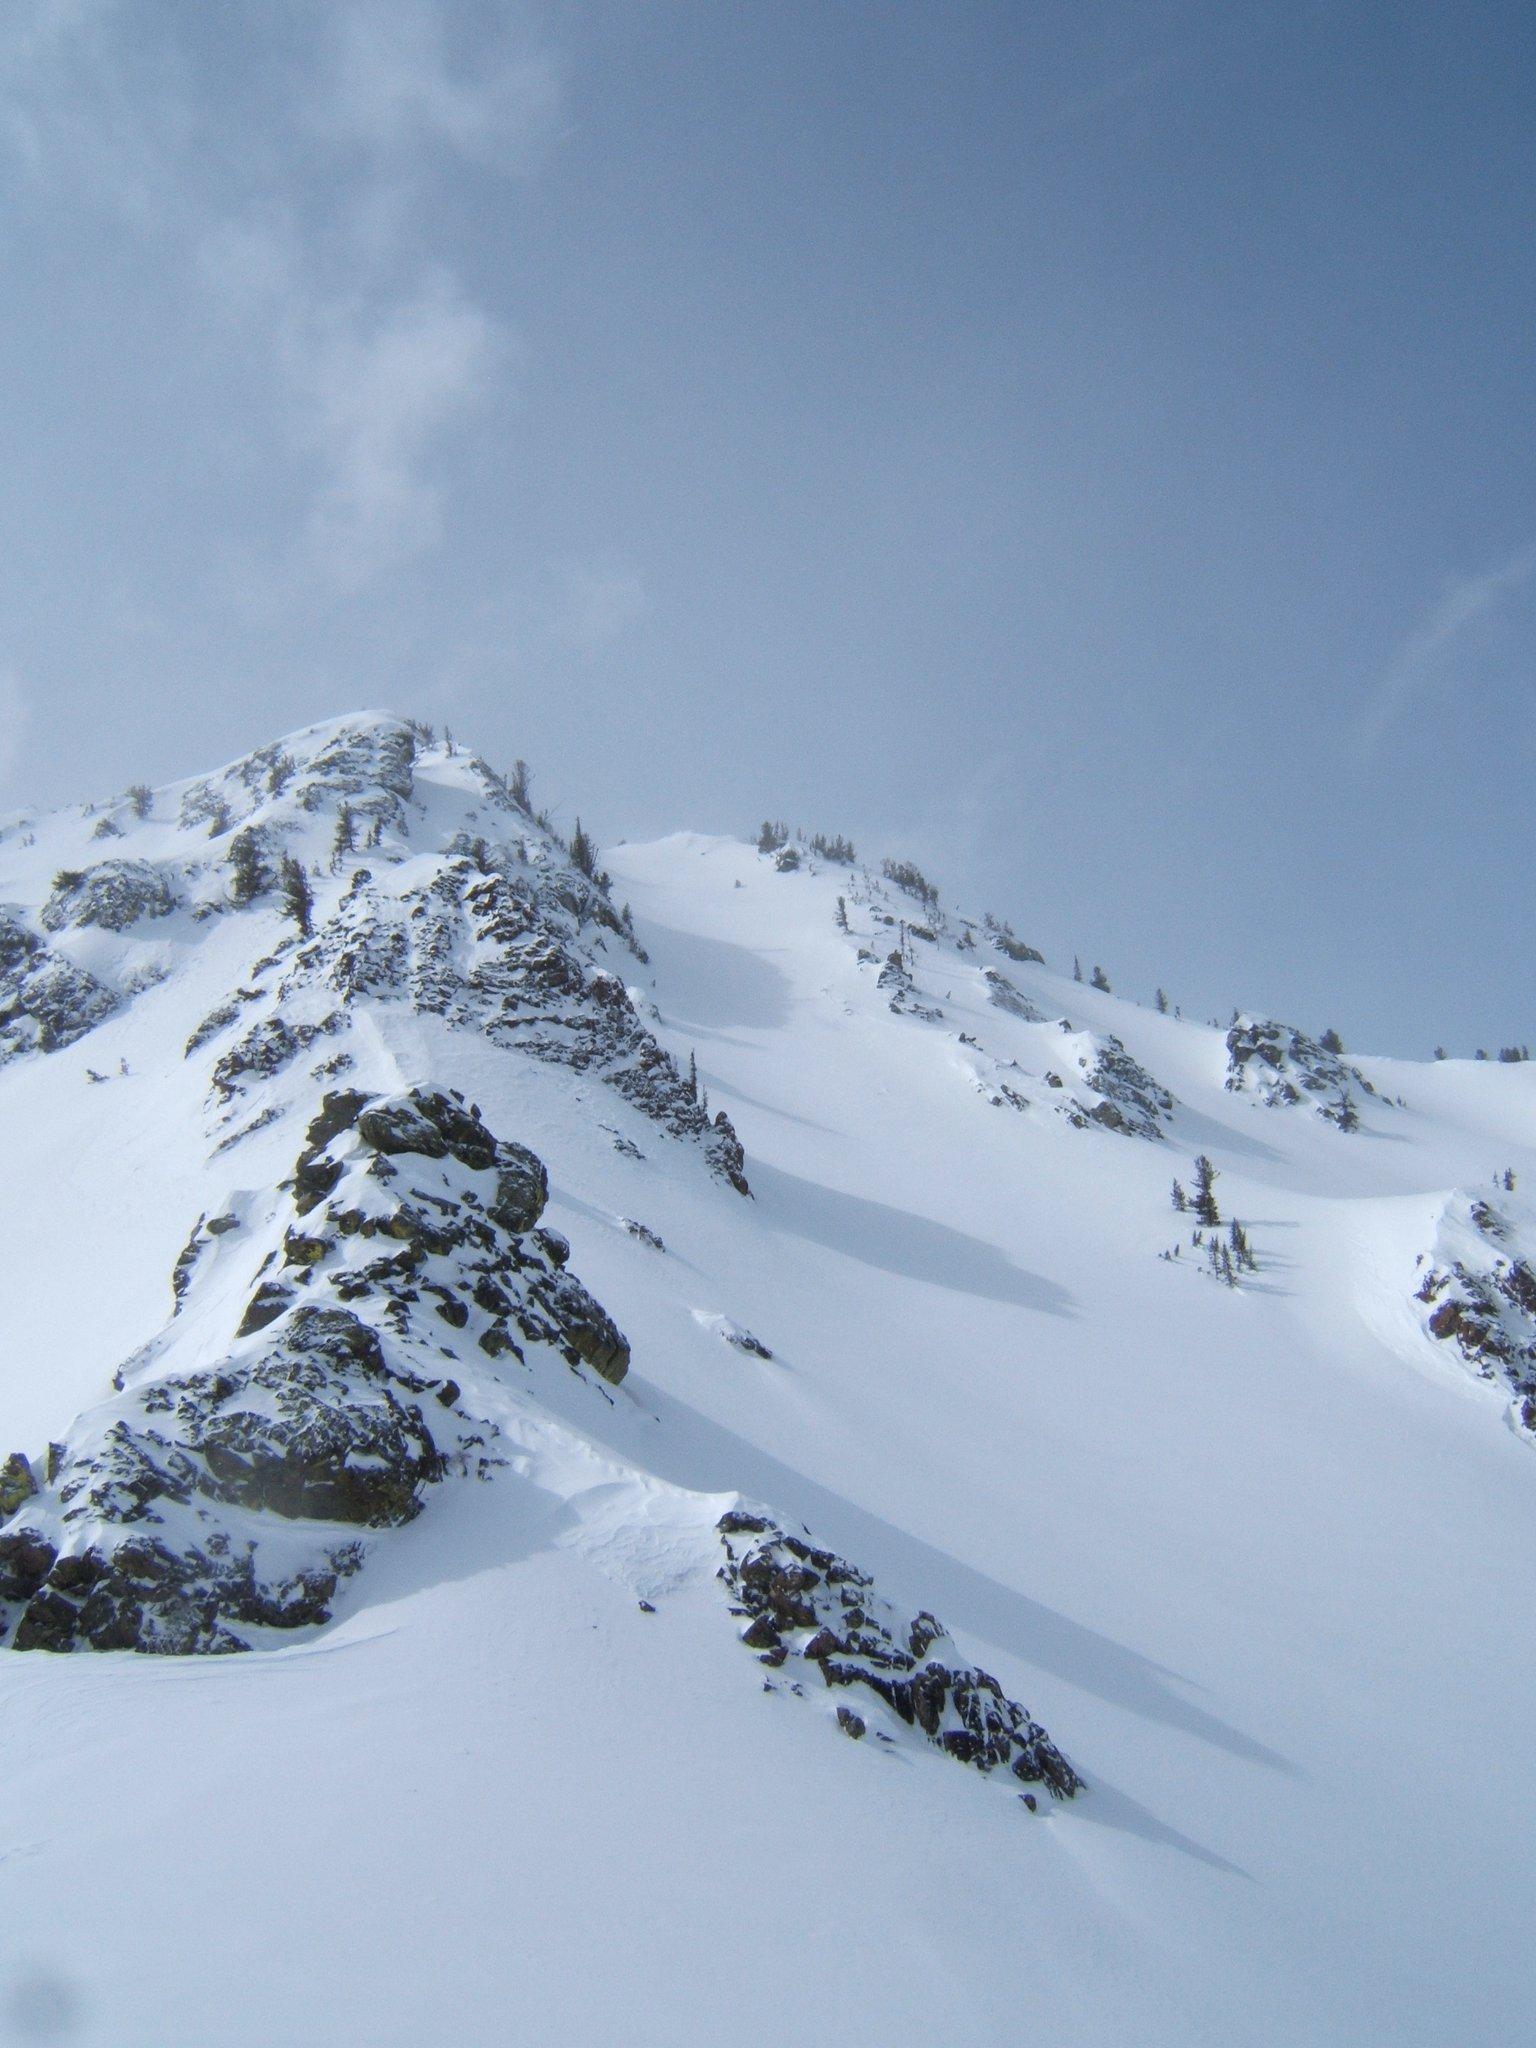 Terrain at Wallowa Alpine Huts